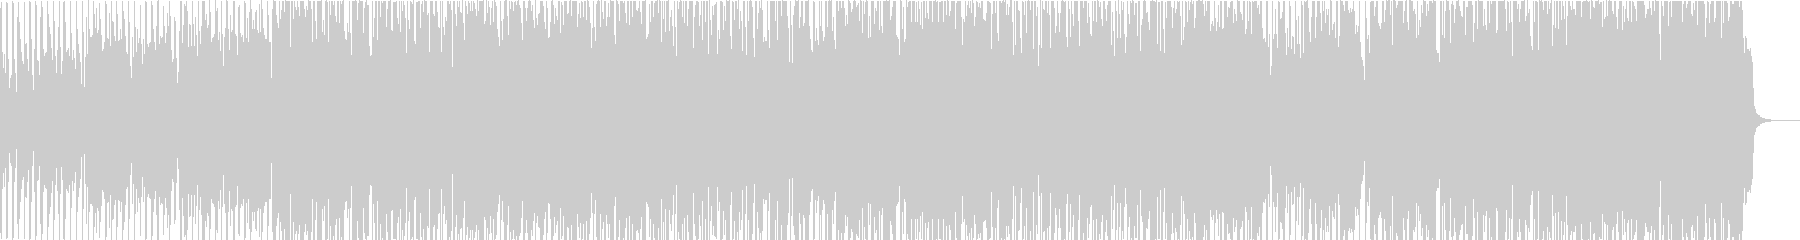 Pinfuの未再生の波形